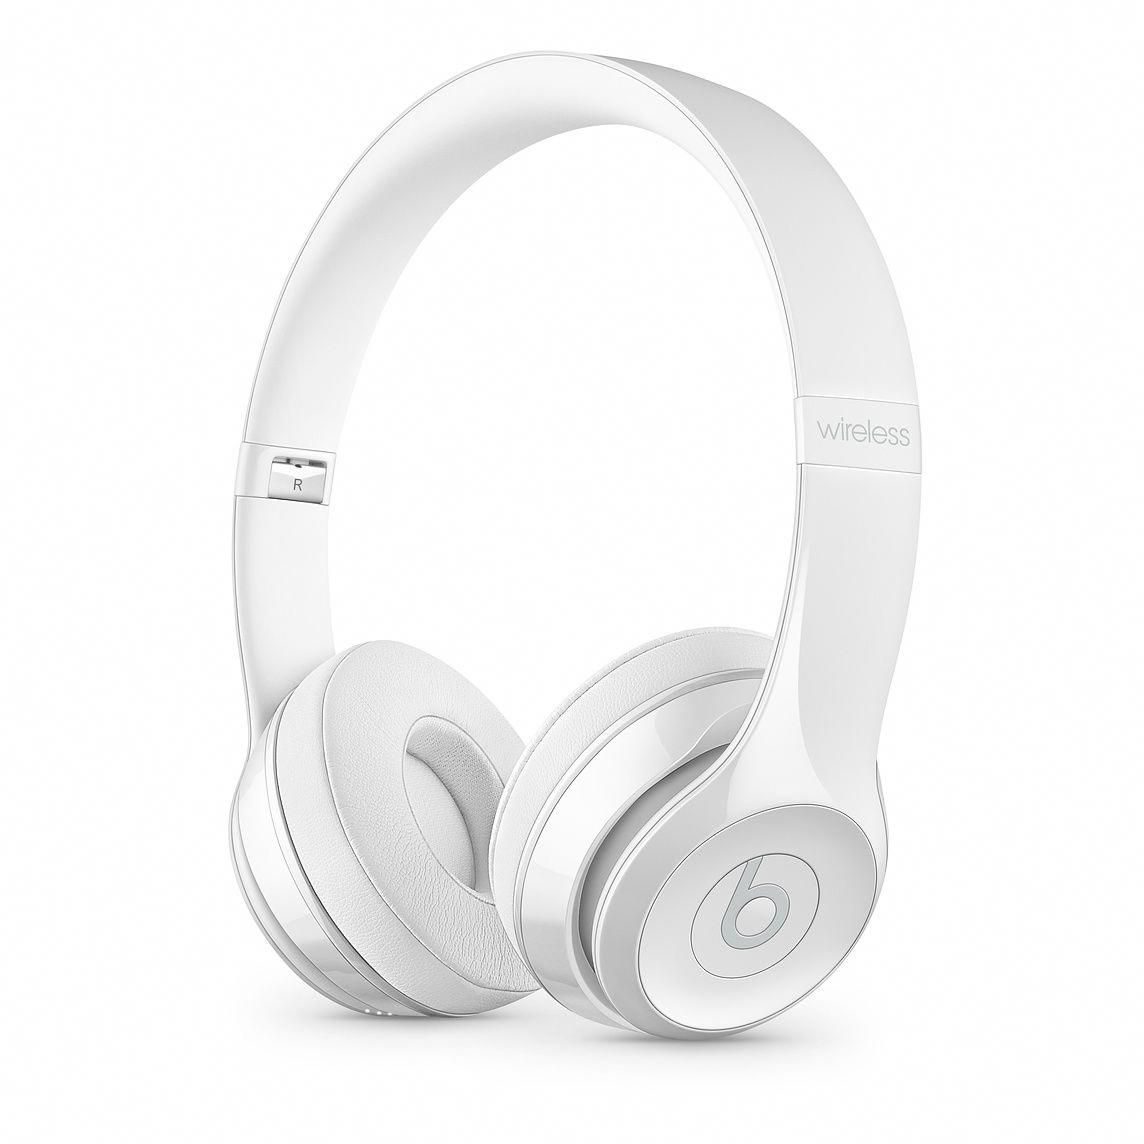 Beats Solo3 Wireless On Ear Headphones Satin Silver Apple Headphones Wireless Headphones In Ear Headphones